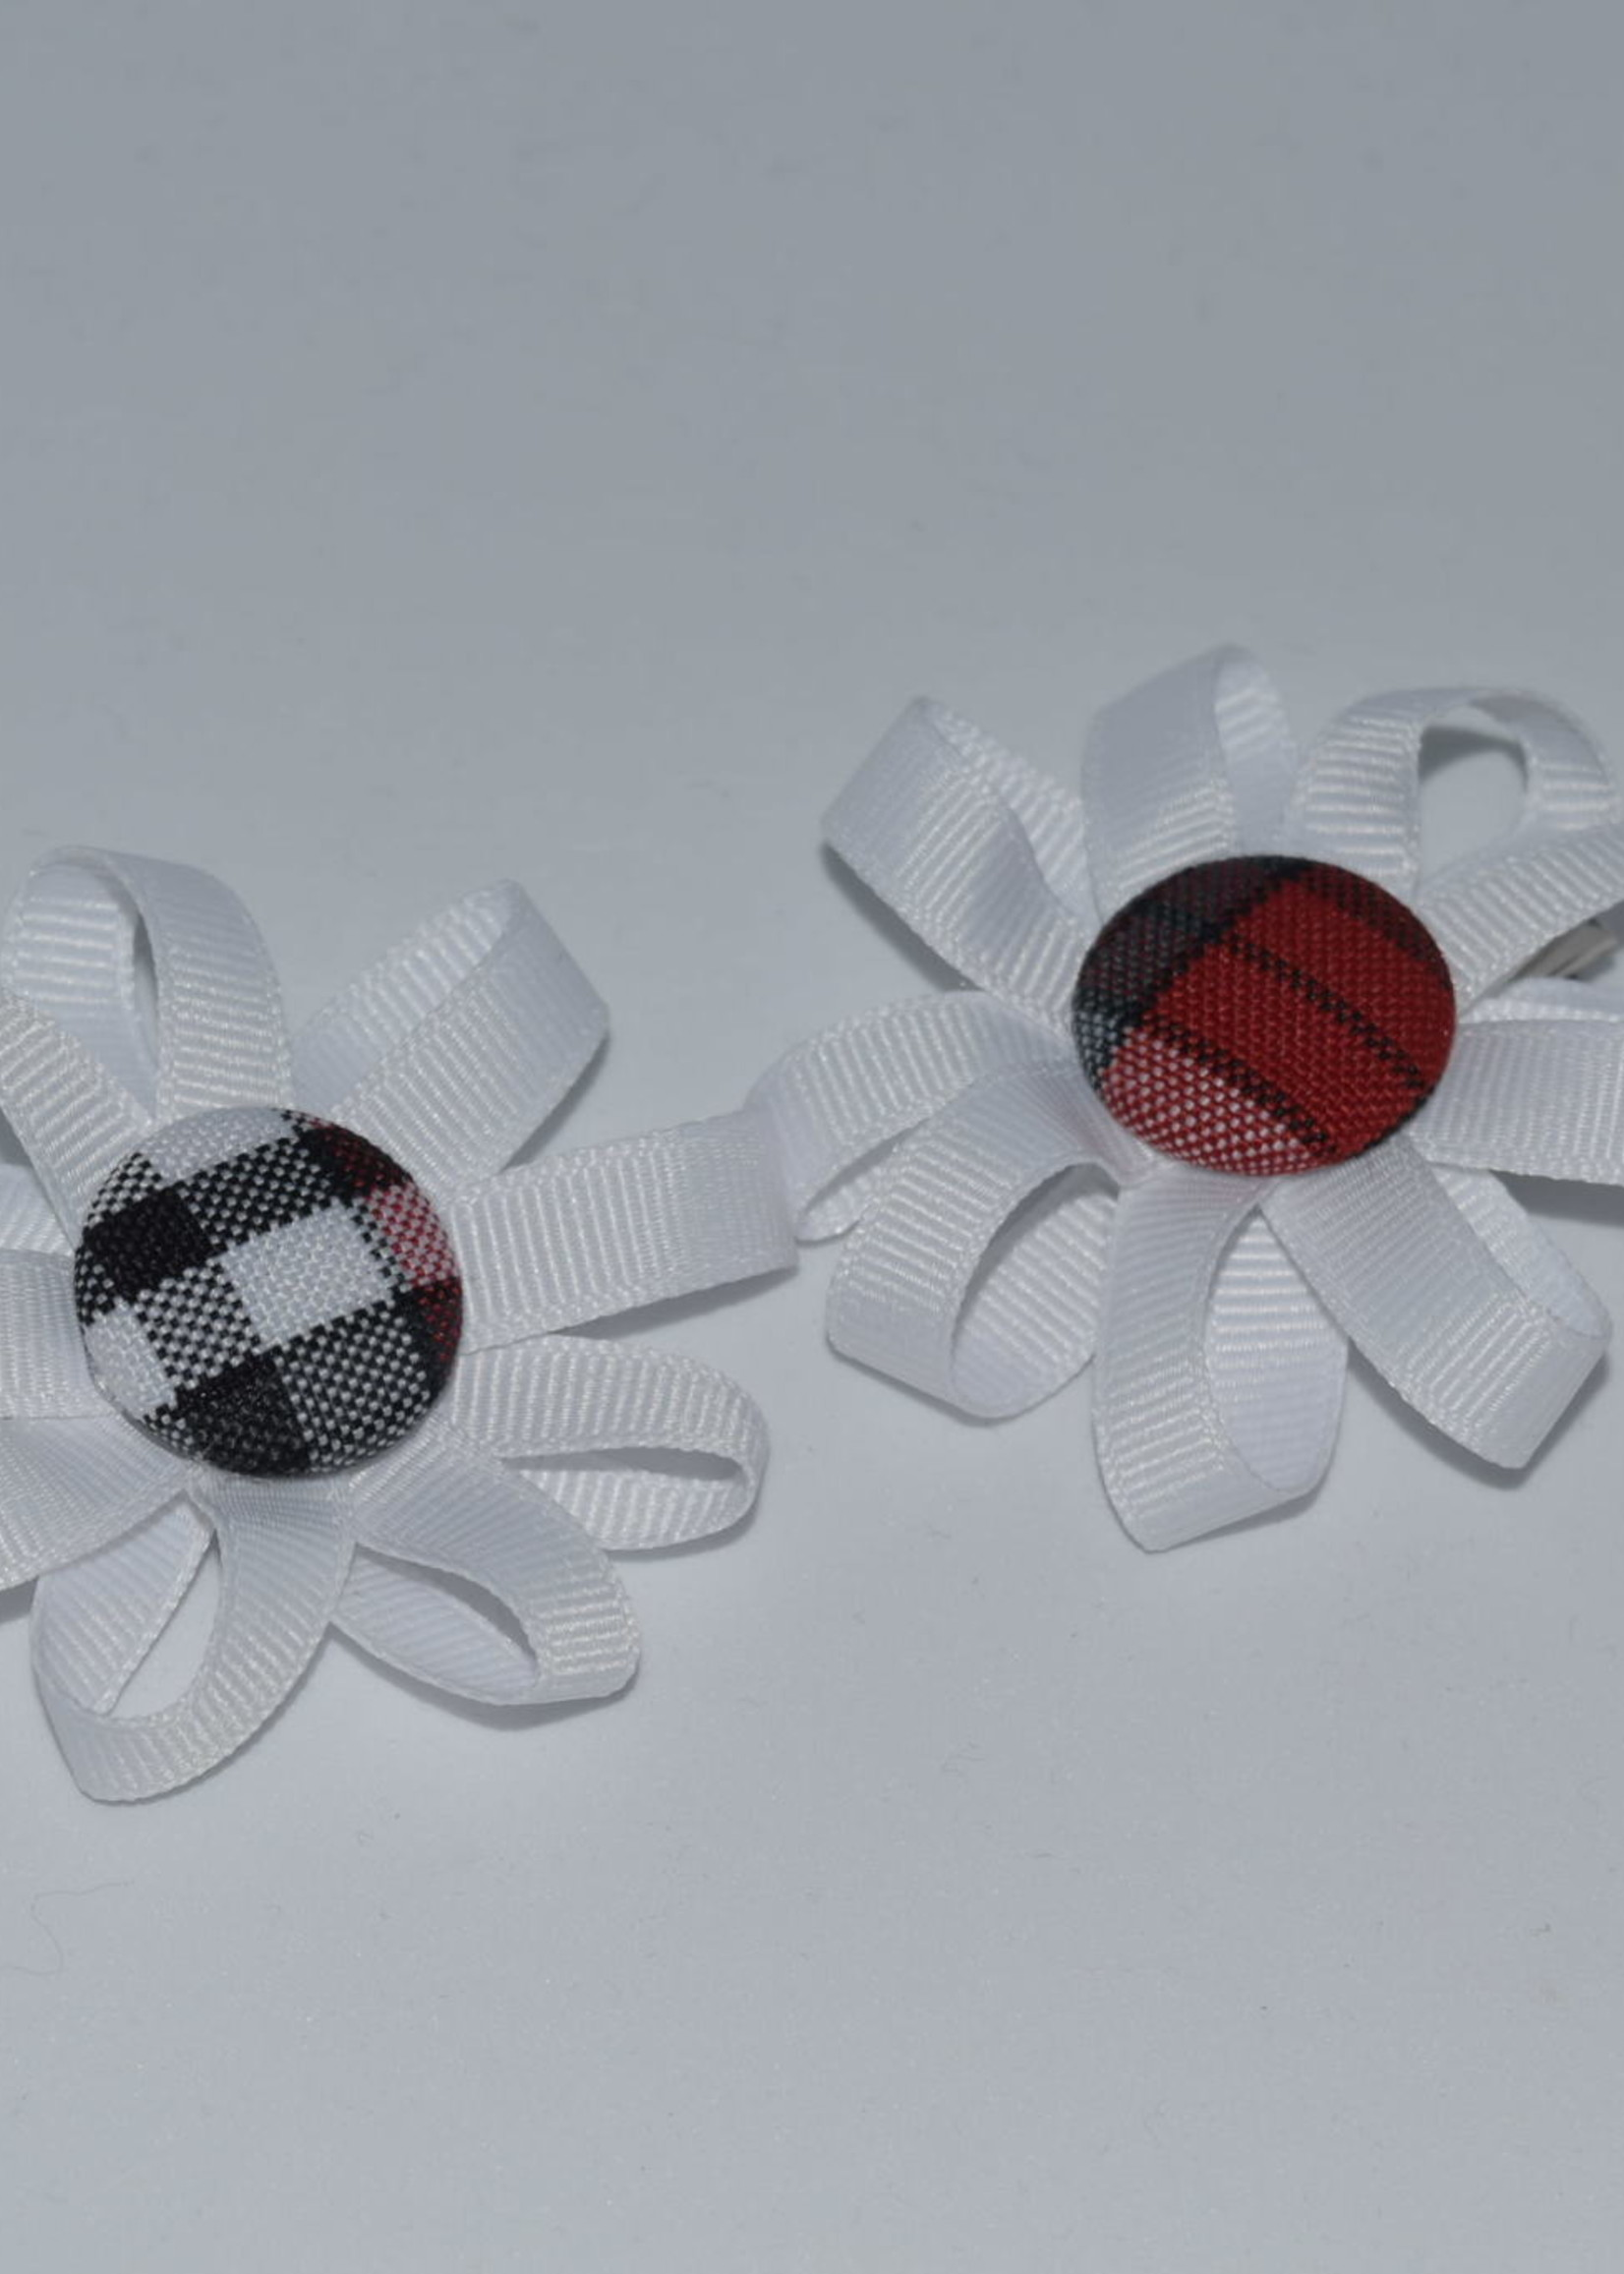 Round Pigtail Ribbon Botton Bows w/plaid center P69 PWT